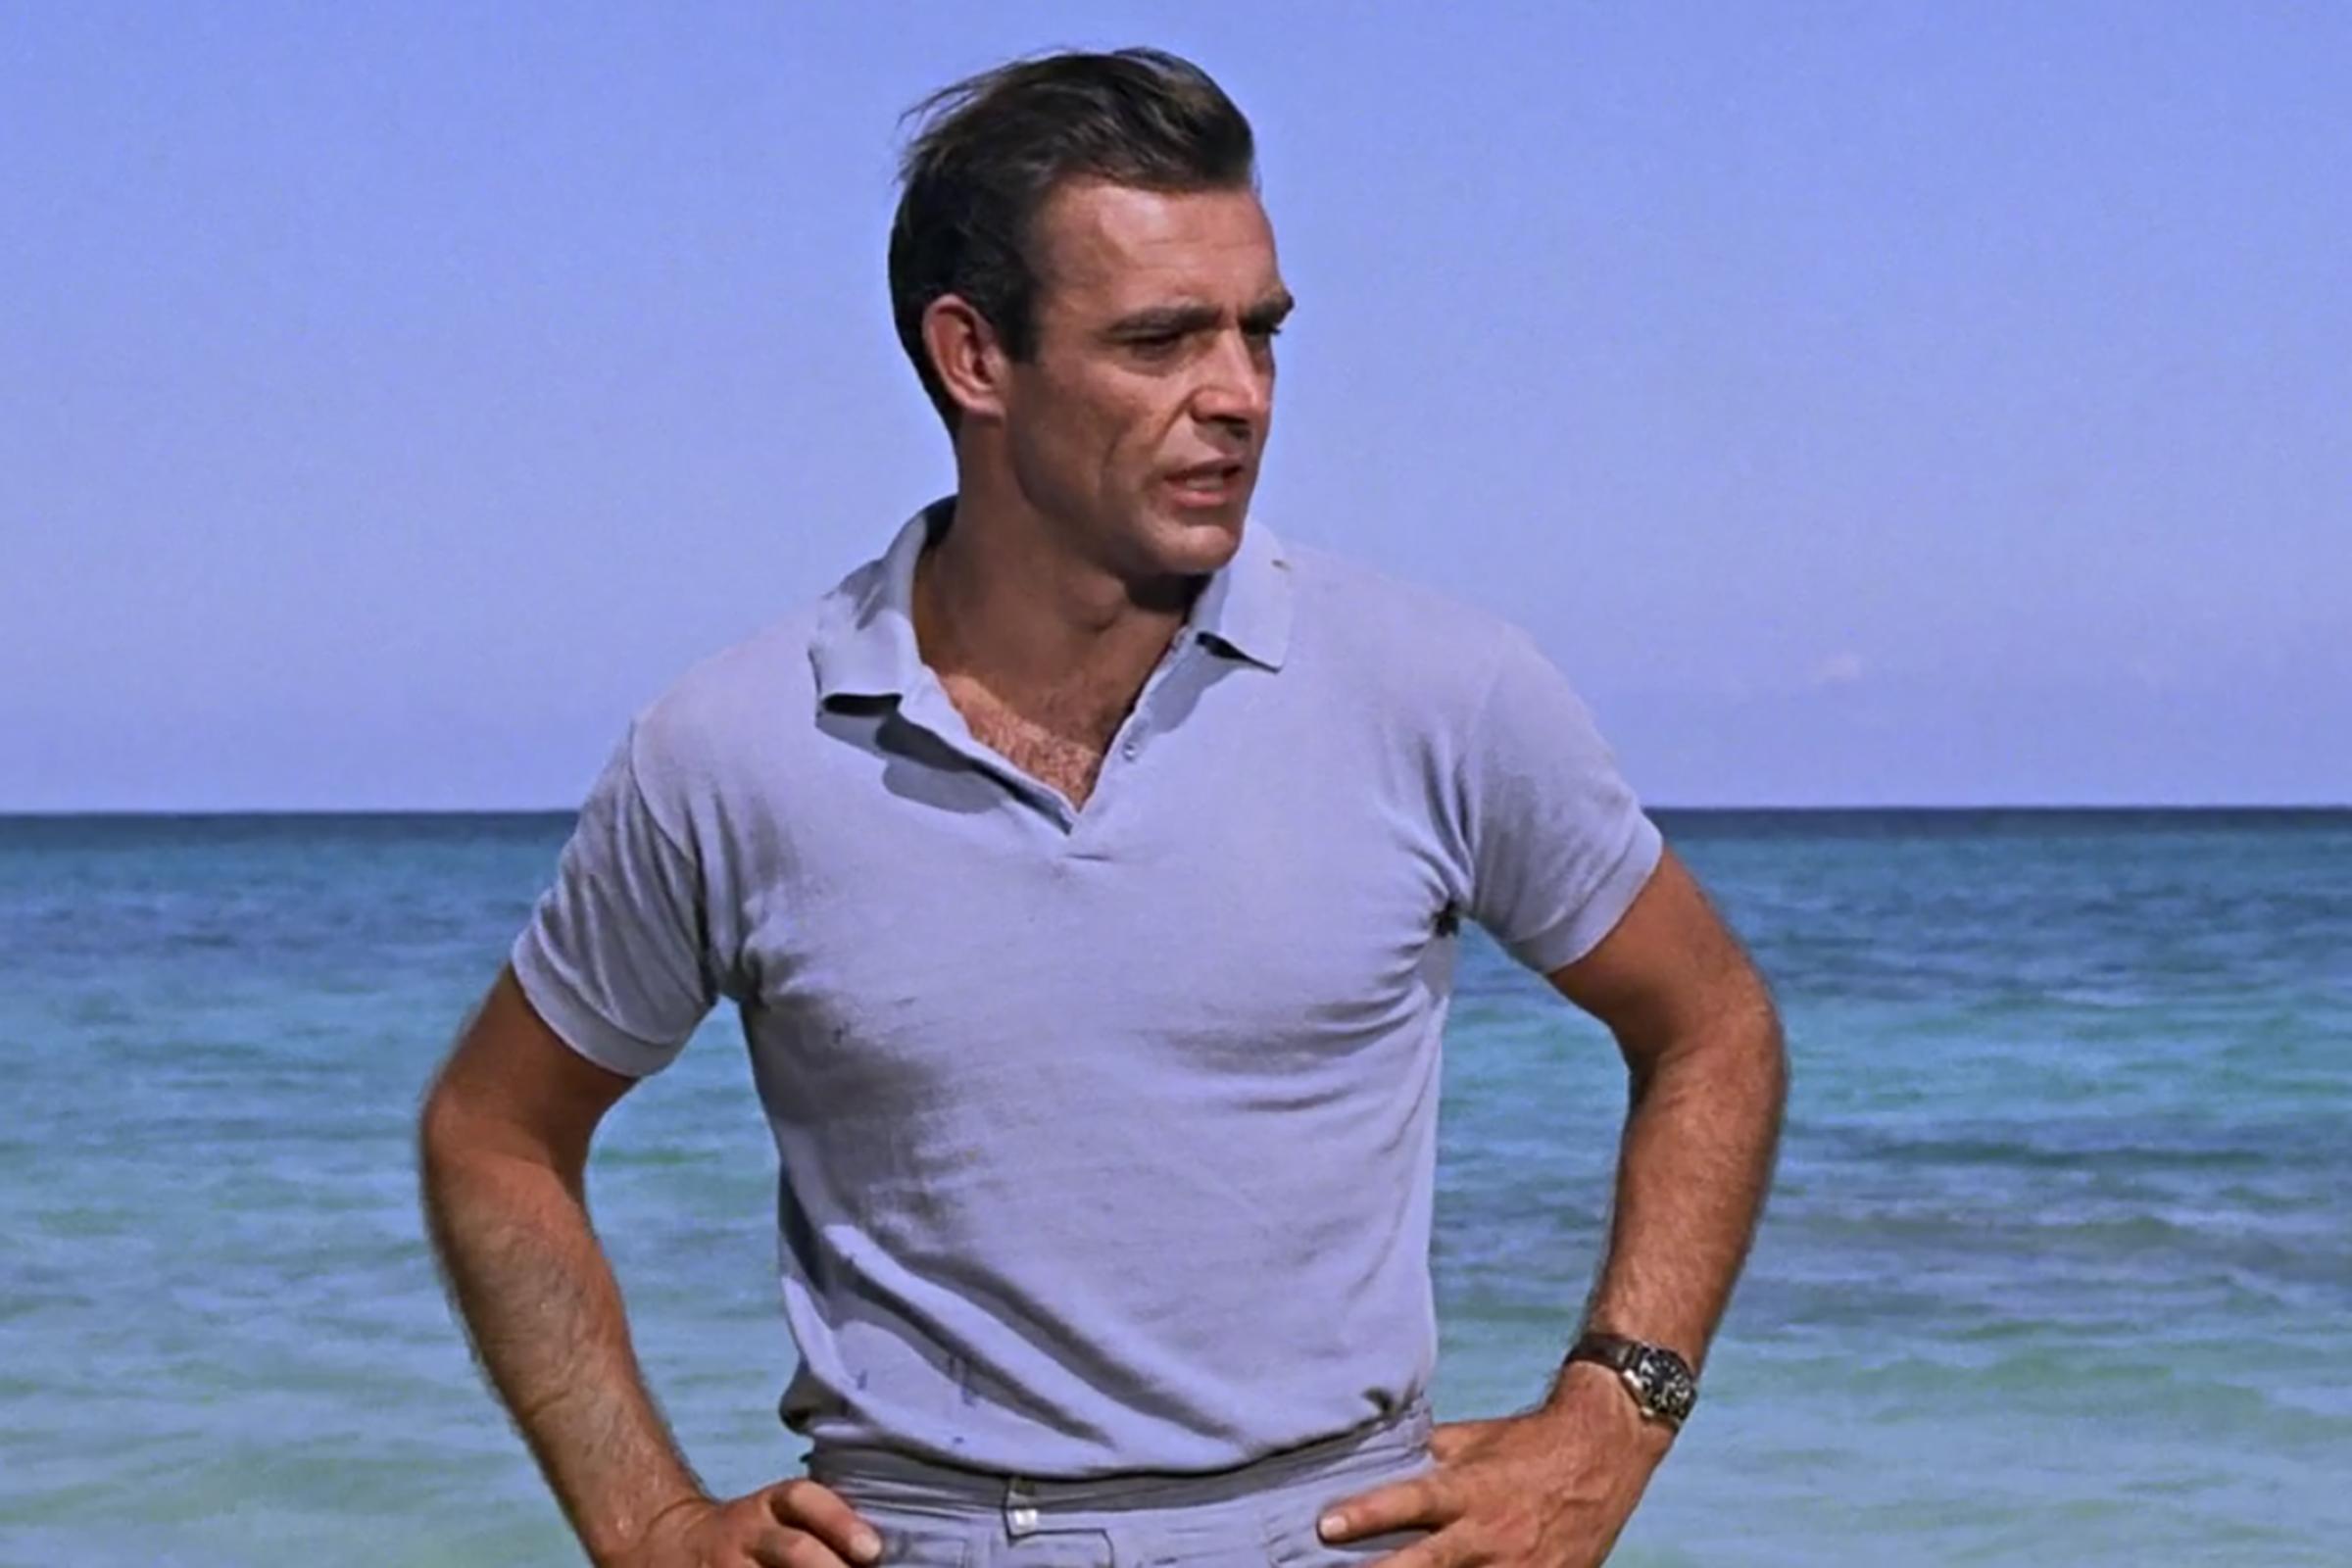 Sean Connery wears this powder blue beach ensemble in the very first James Bond film, Dr. No.